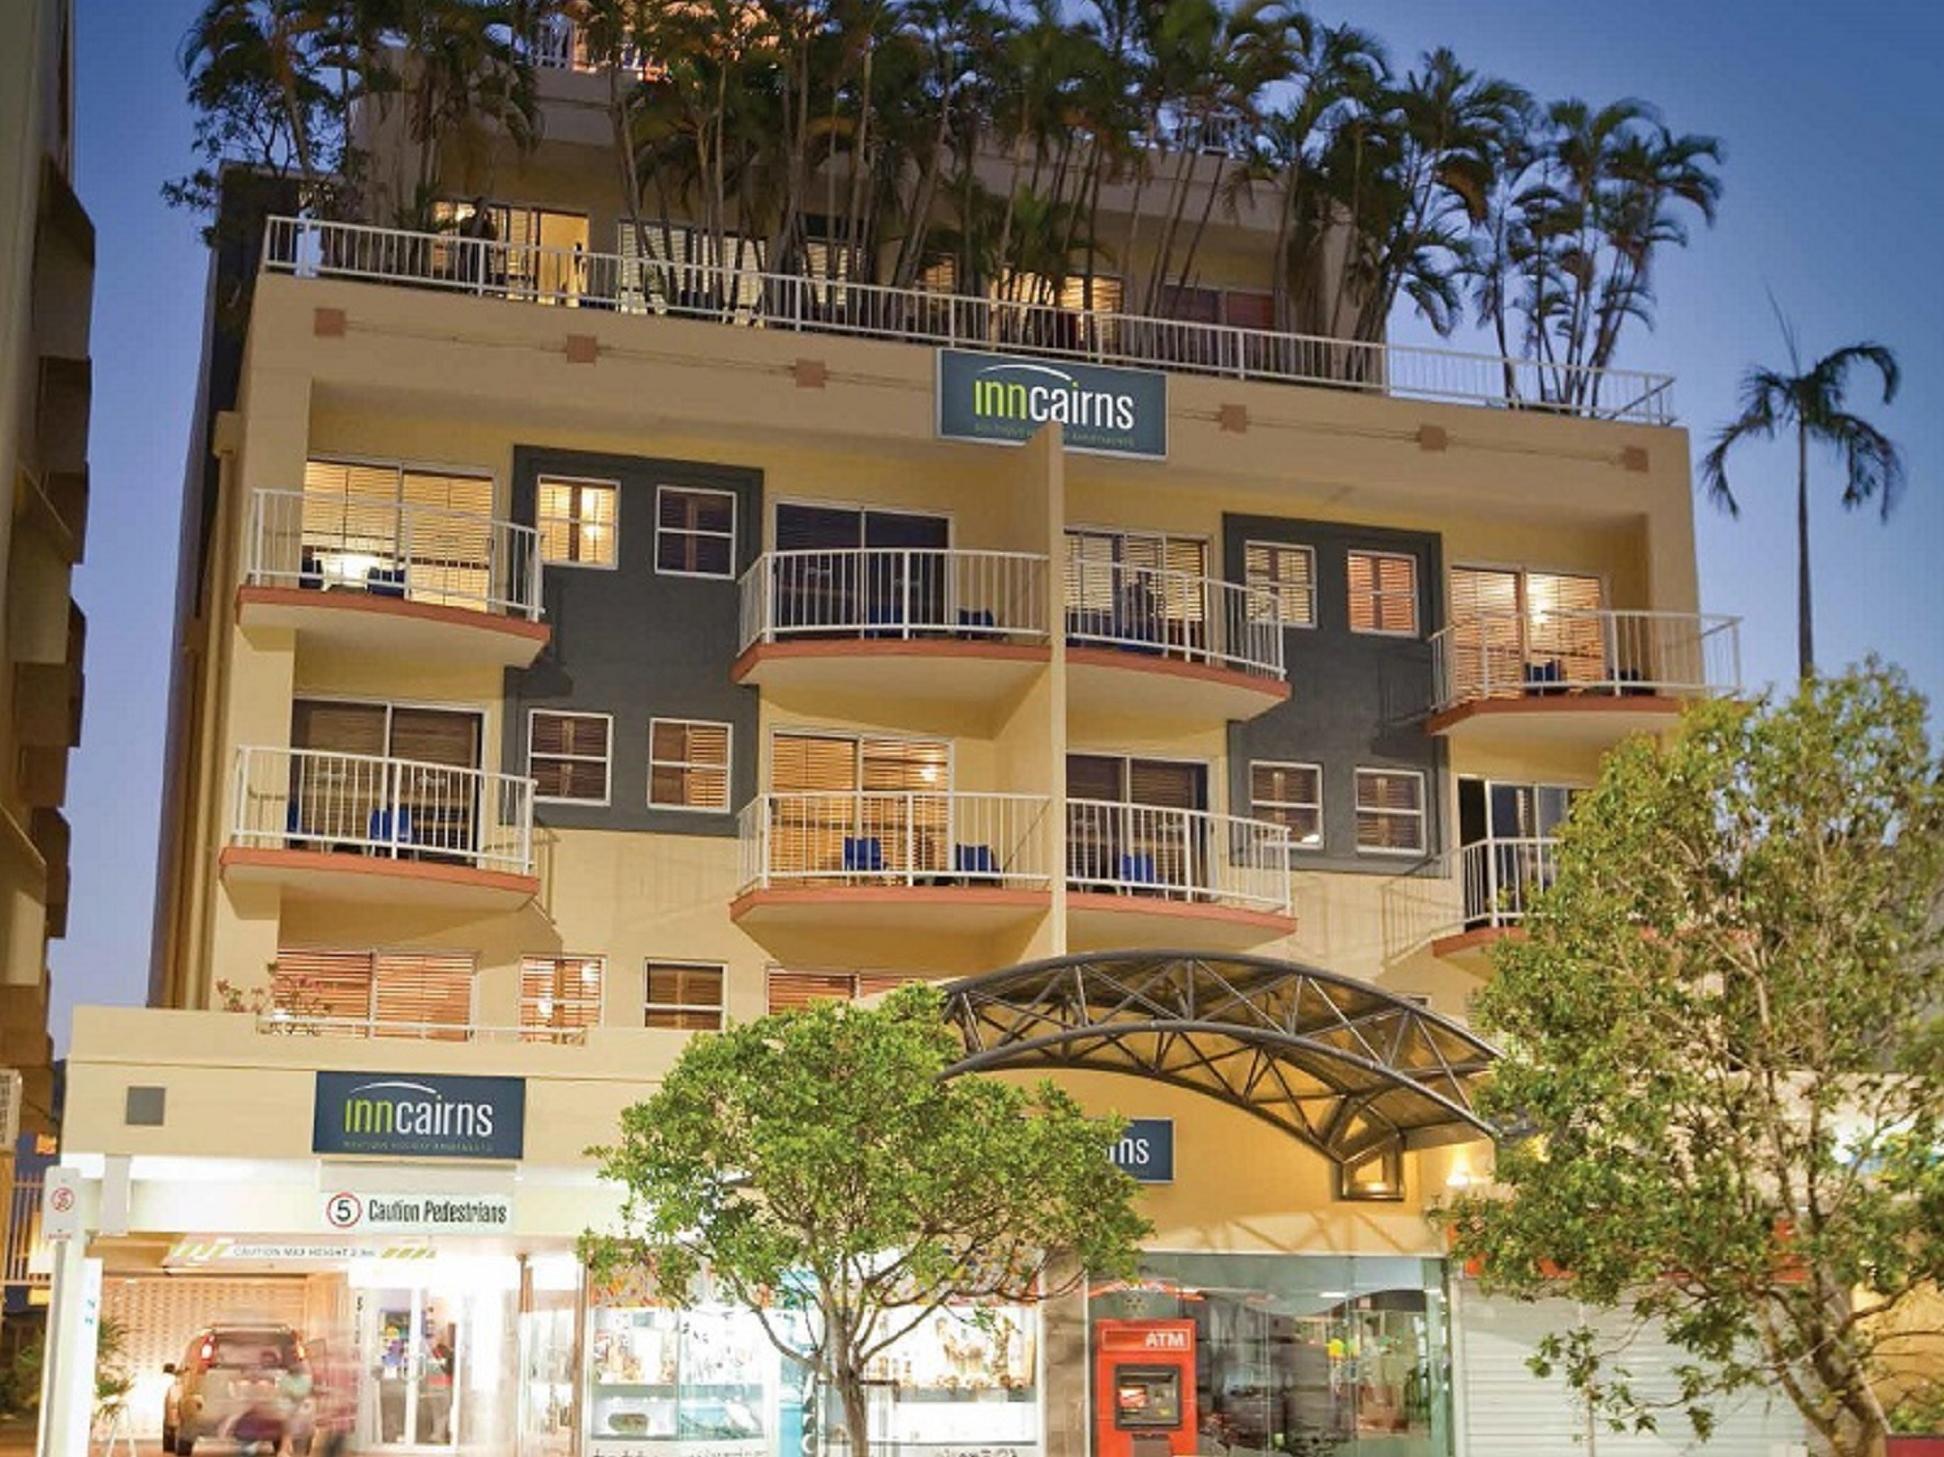 Superior Inn Cairns Boutique Apartments